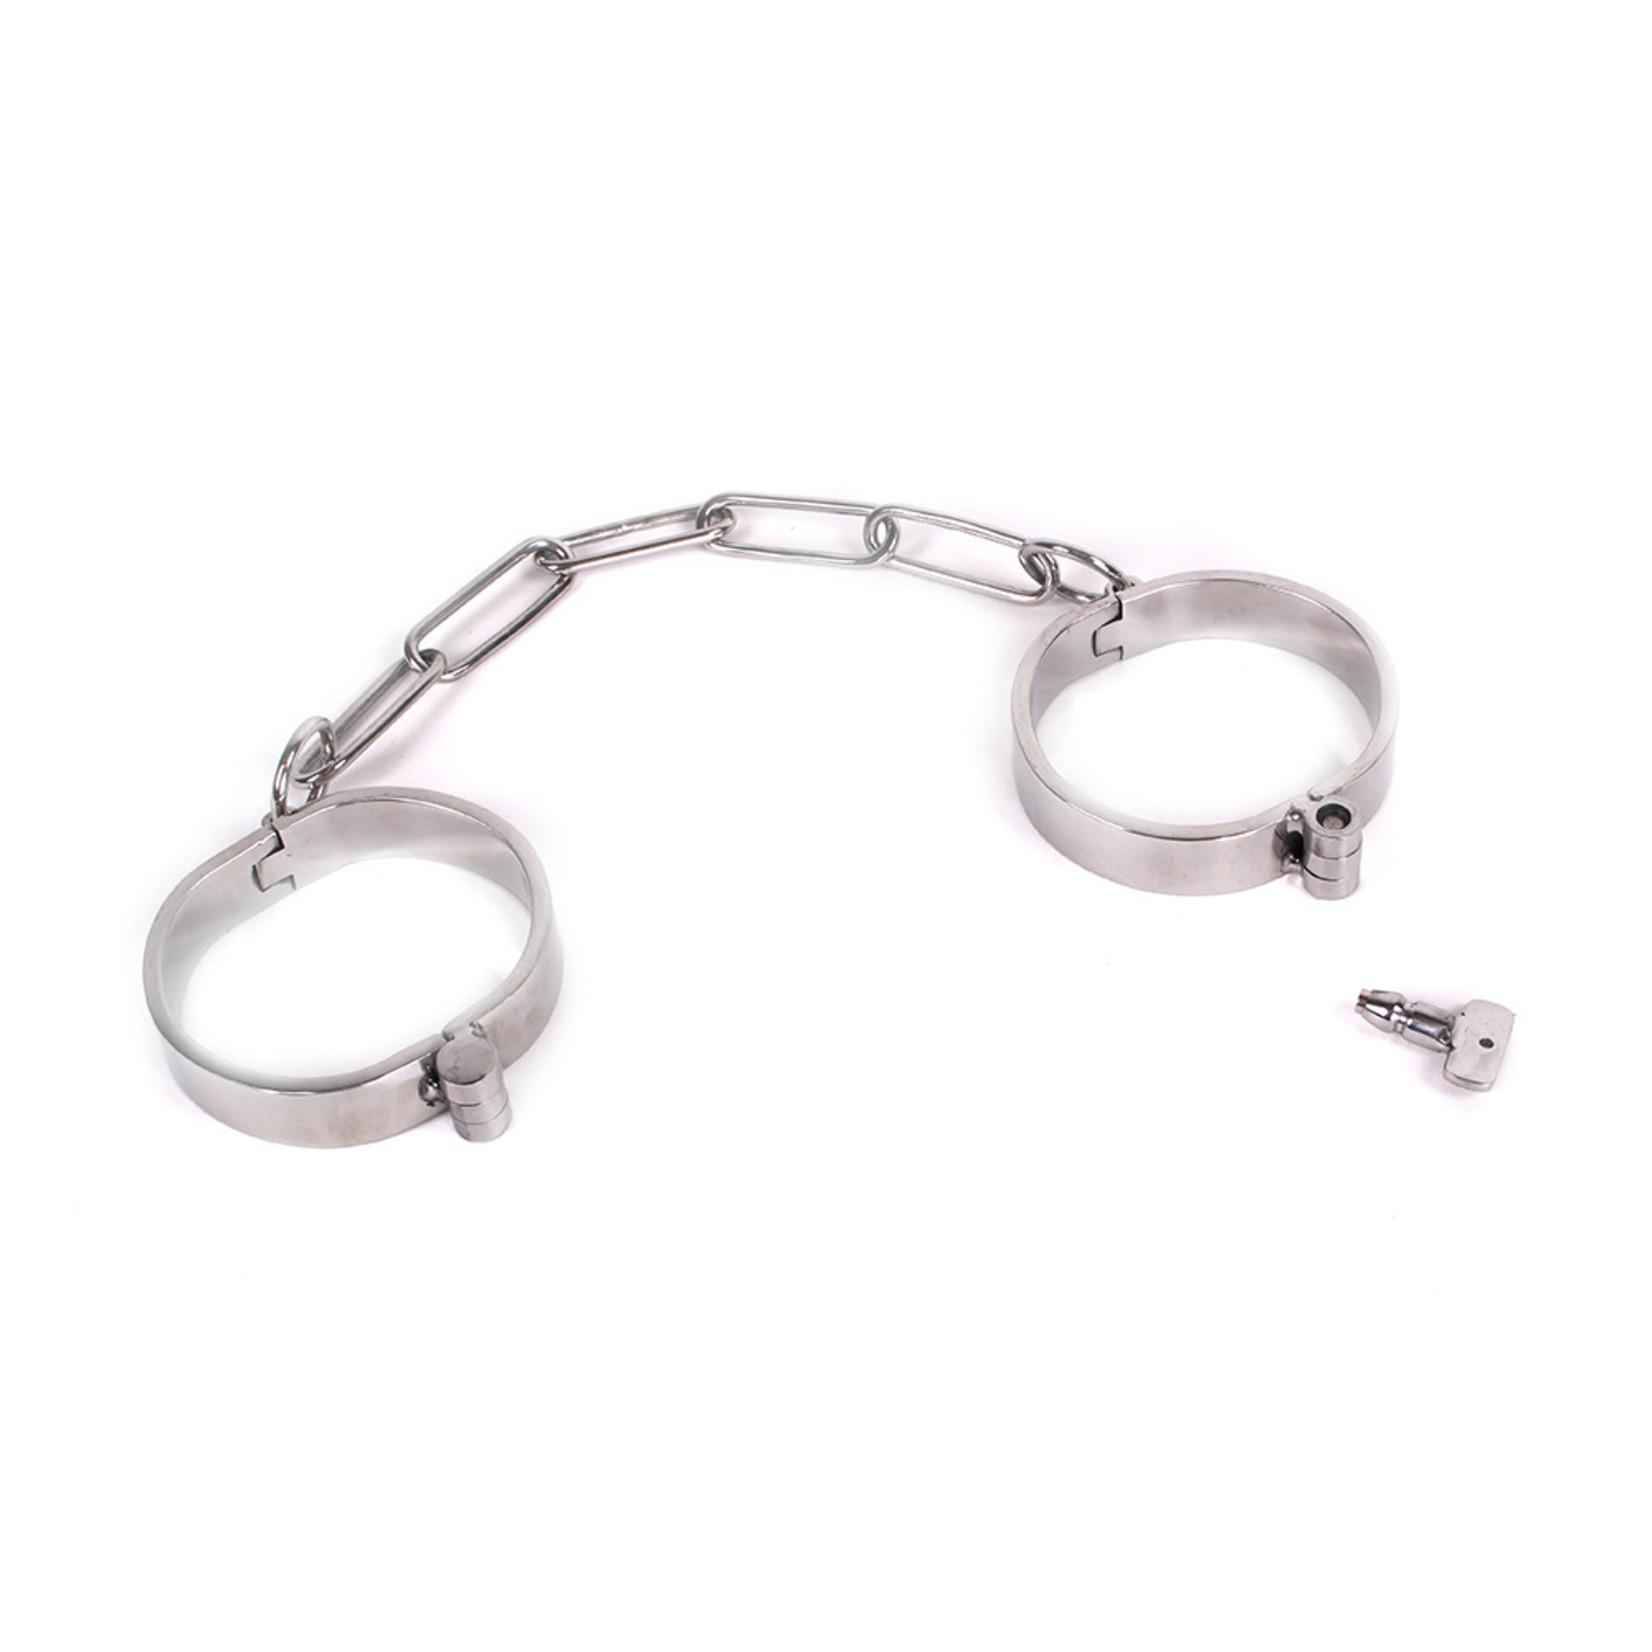 KIOTOS Steel Ankle Cuffs /w Magnetic Key